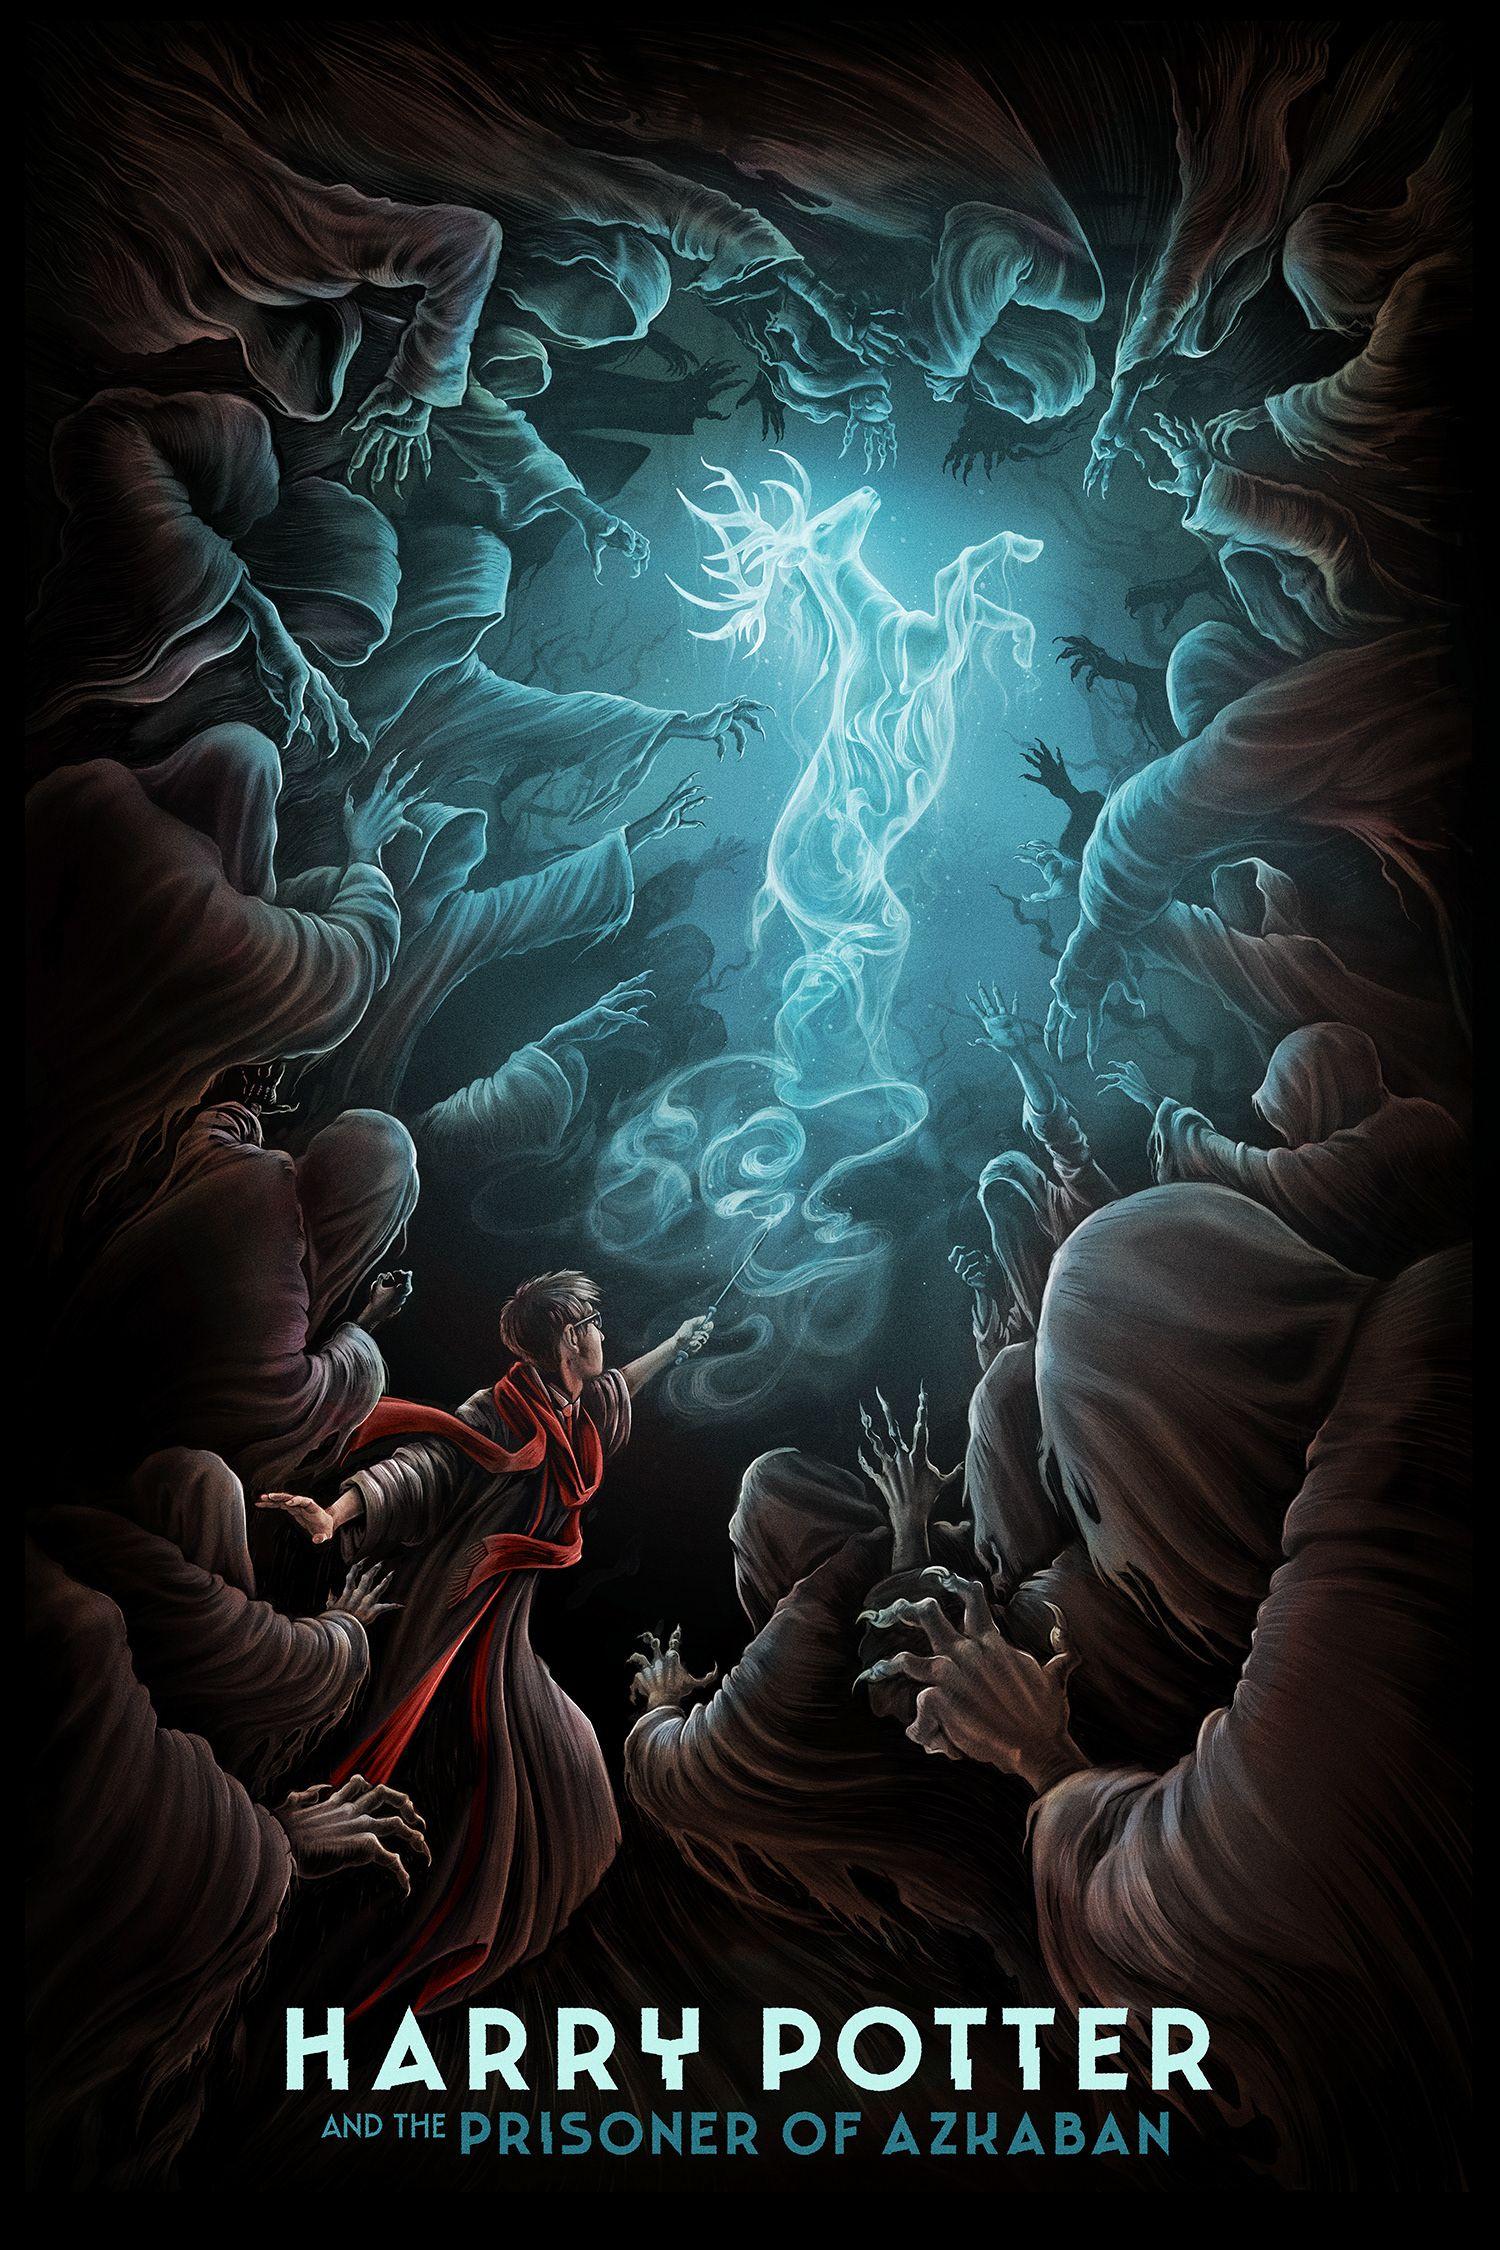 Harry Potter On Behance By Muti Harry Potter Poster Harry Potter Artwork Harry Potter Illustrations